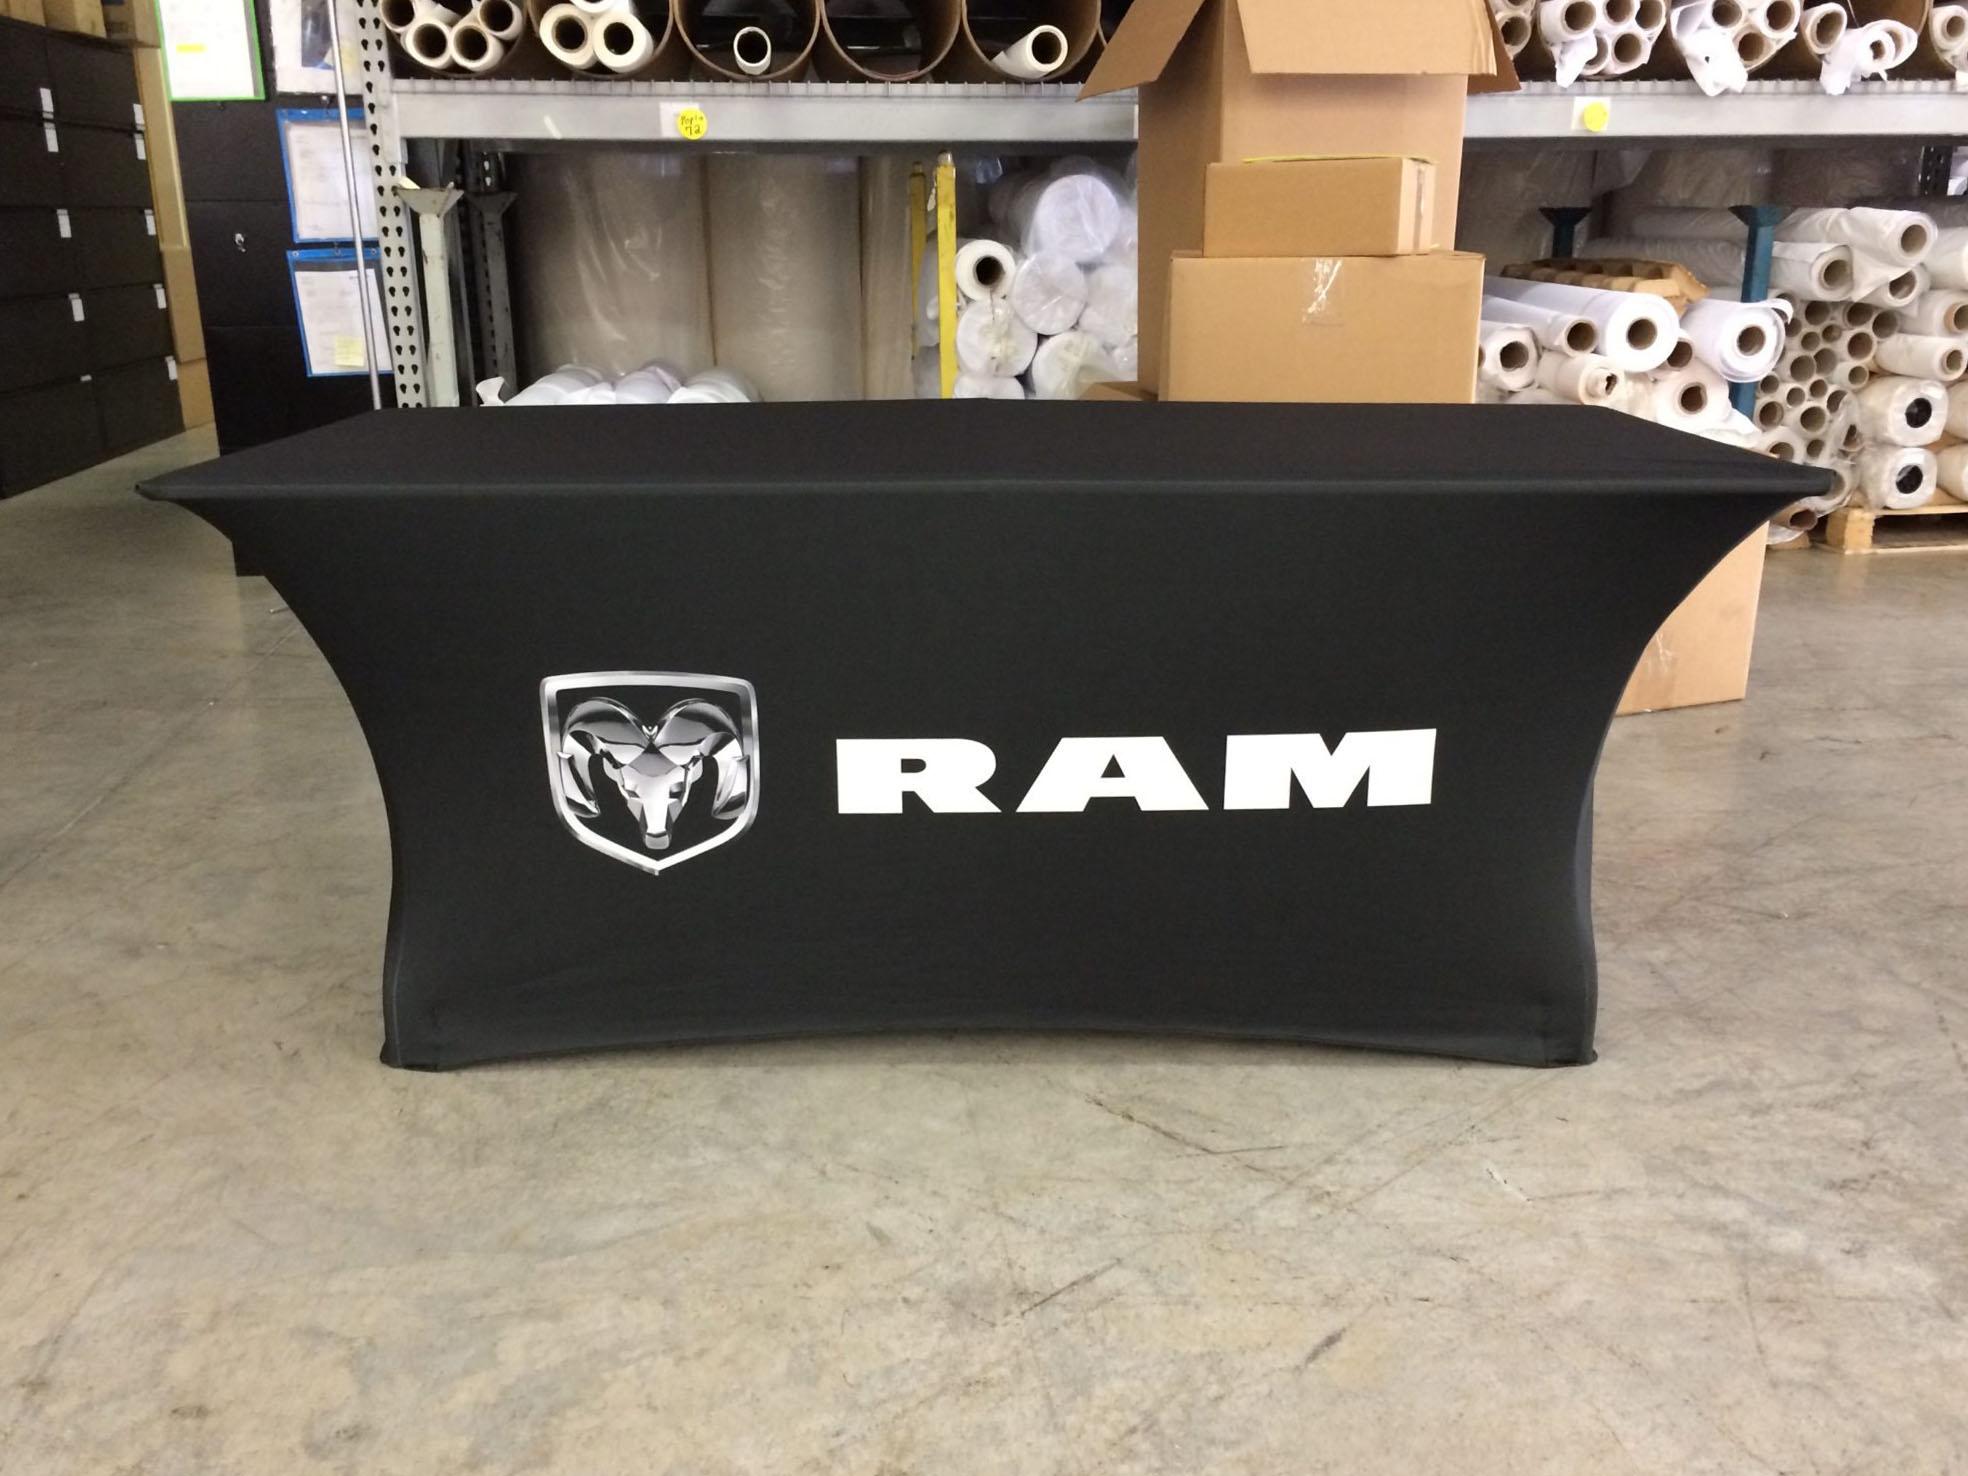 Table throw ram logo.